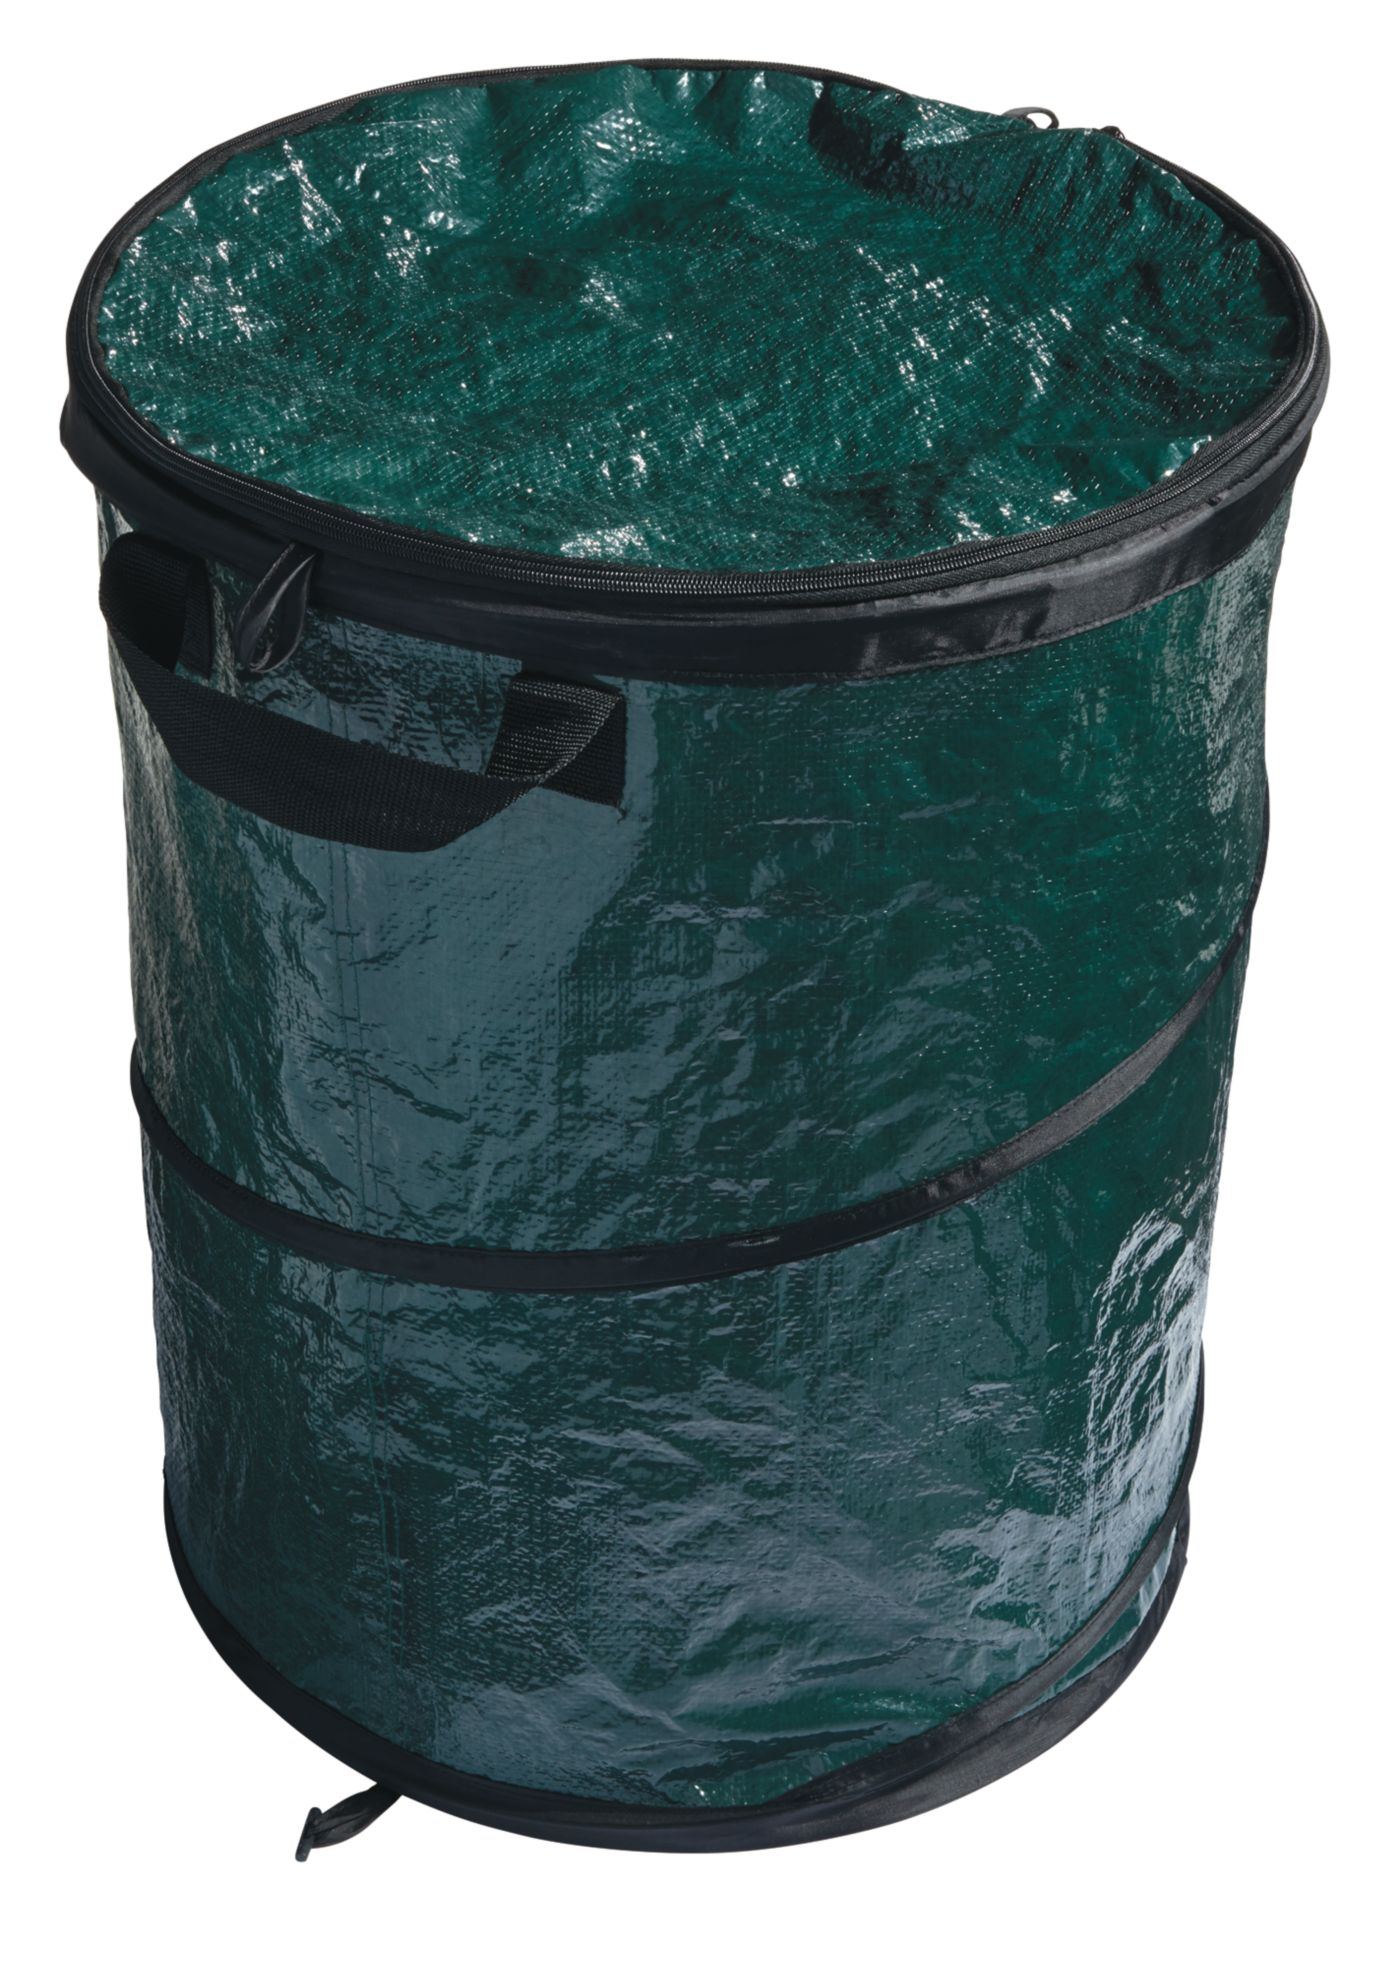 Field & Stream Pop-Up Trash Can